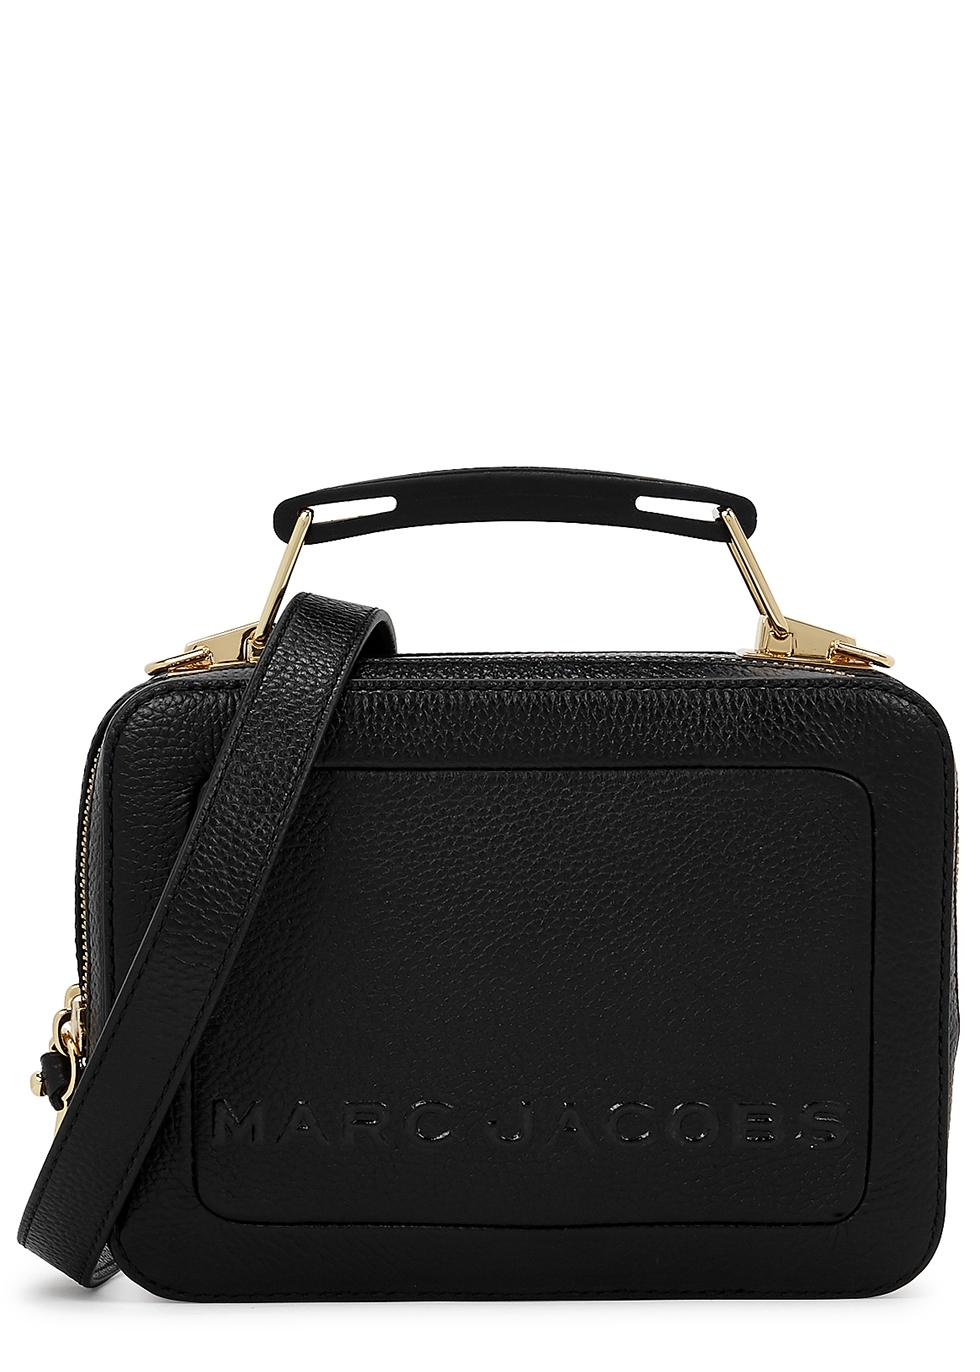 The Box 20 black leather cross-body bag